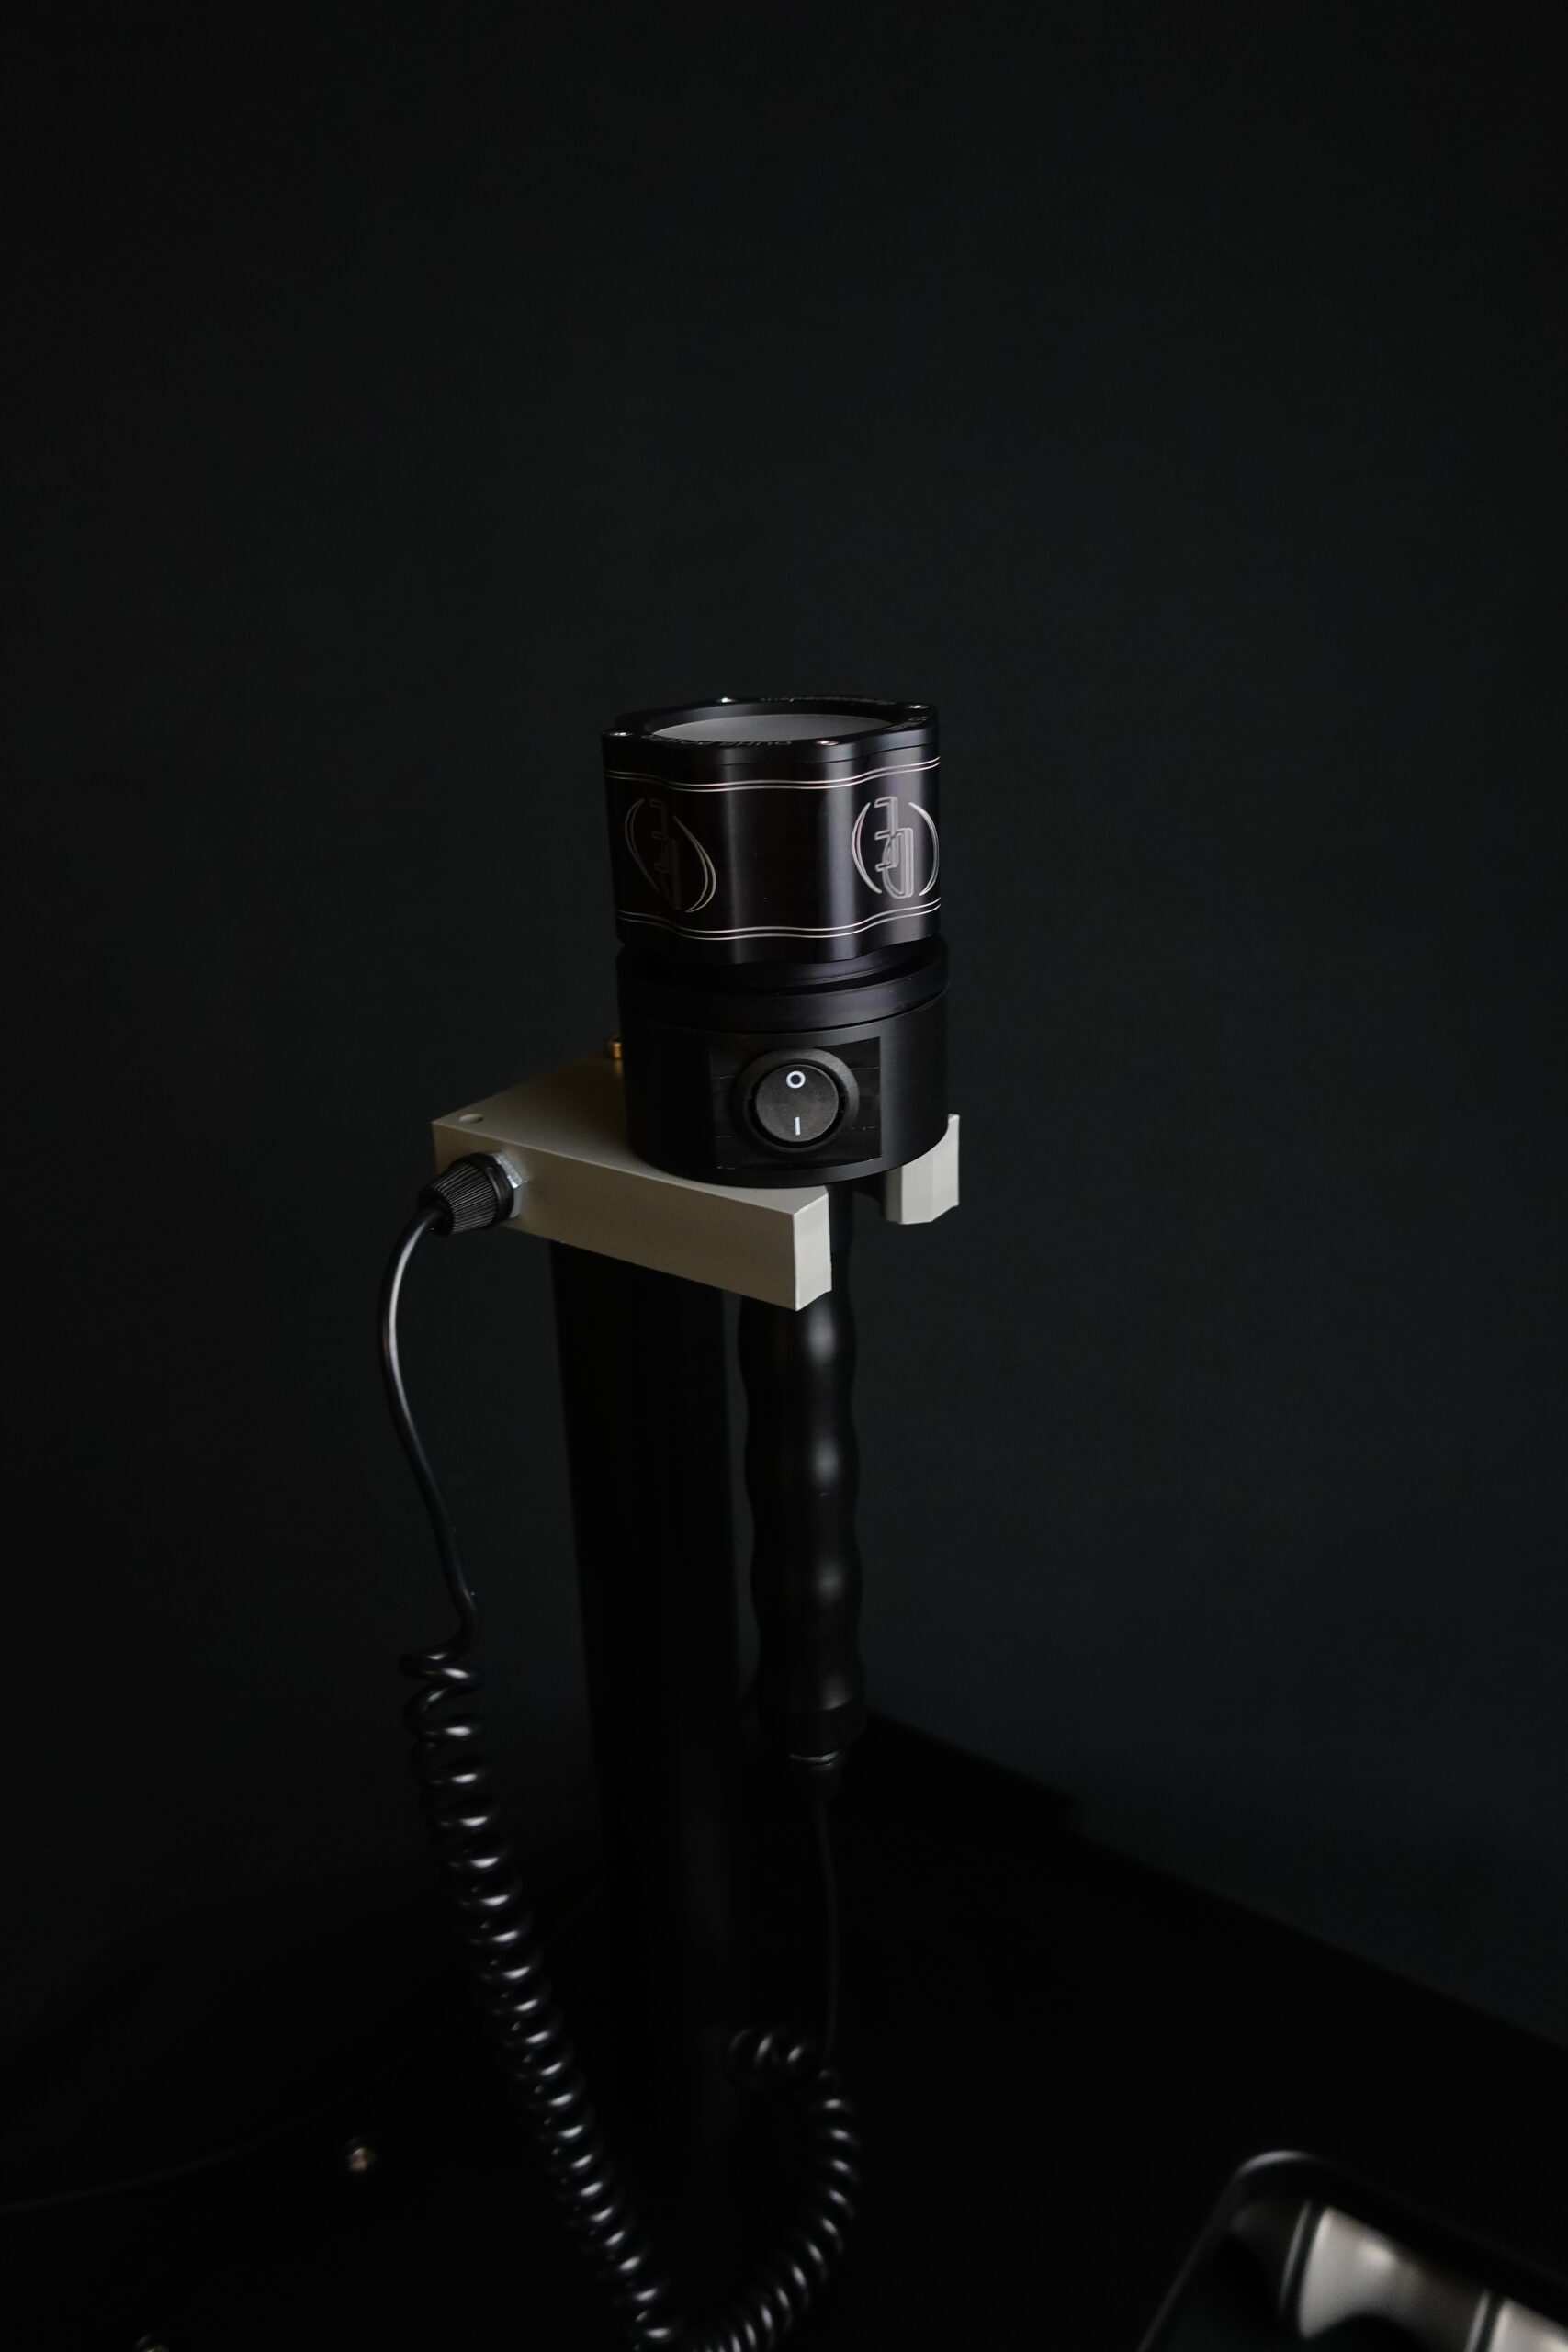 15 Watt Handinspektionslampe